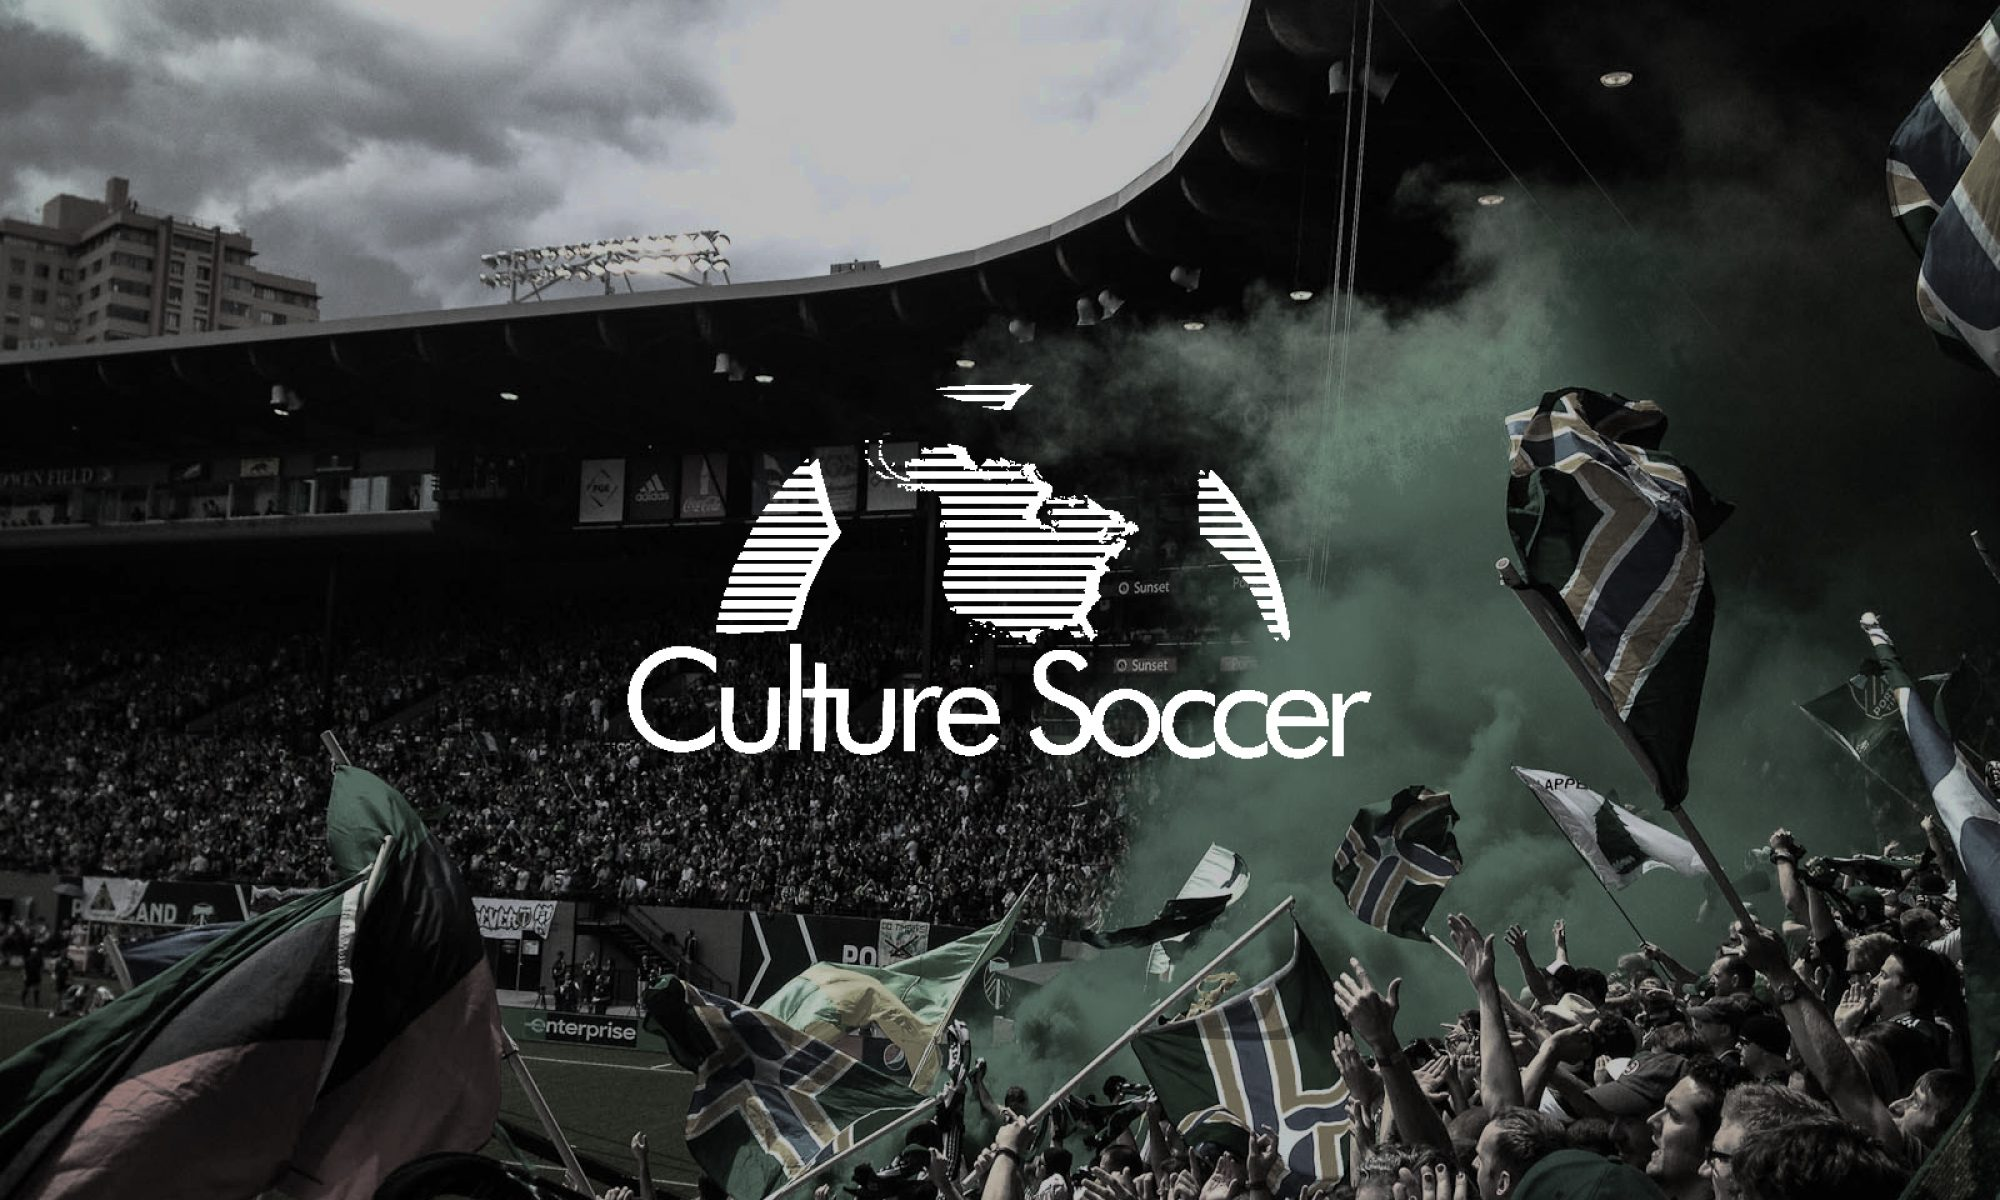 Culture Soccer